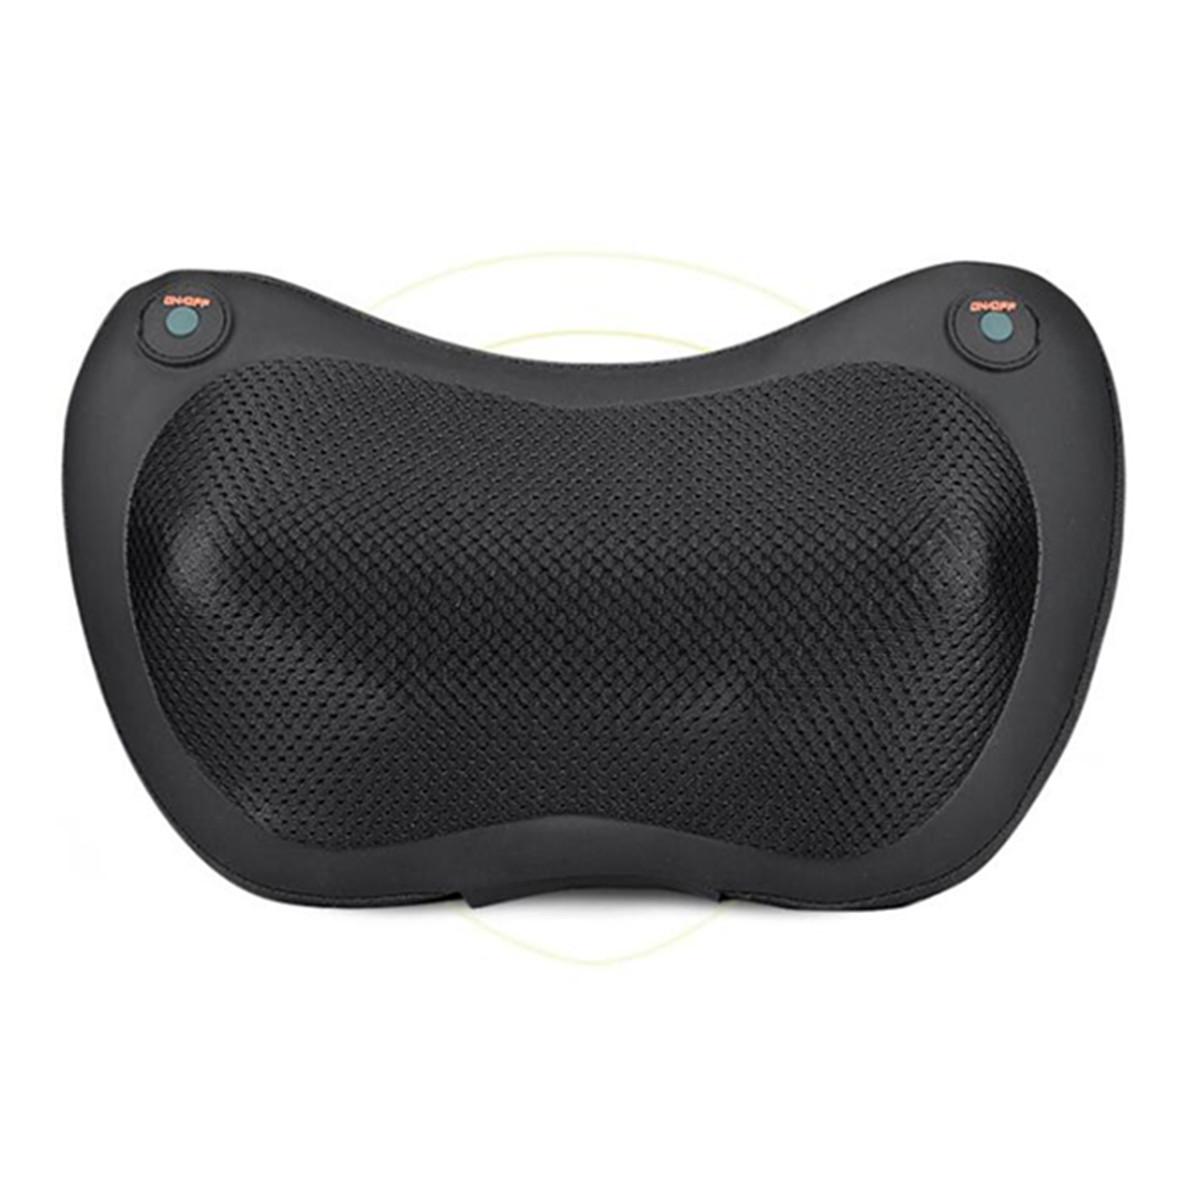 4/8 Heads Electric Shiatsu Massager Pillow Infrared Heating Back Neck Pillow Car Seat Cushion Electric Massager